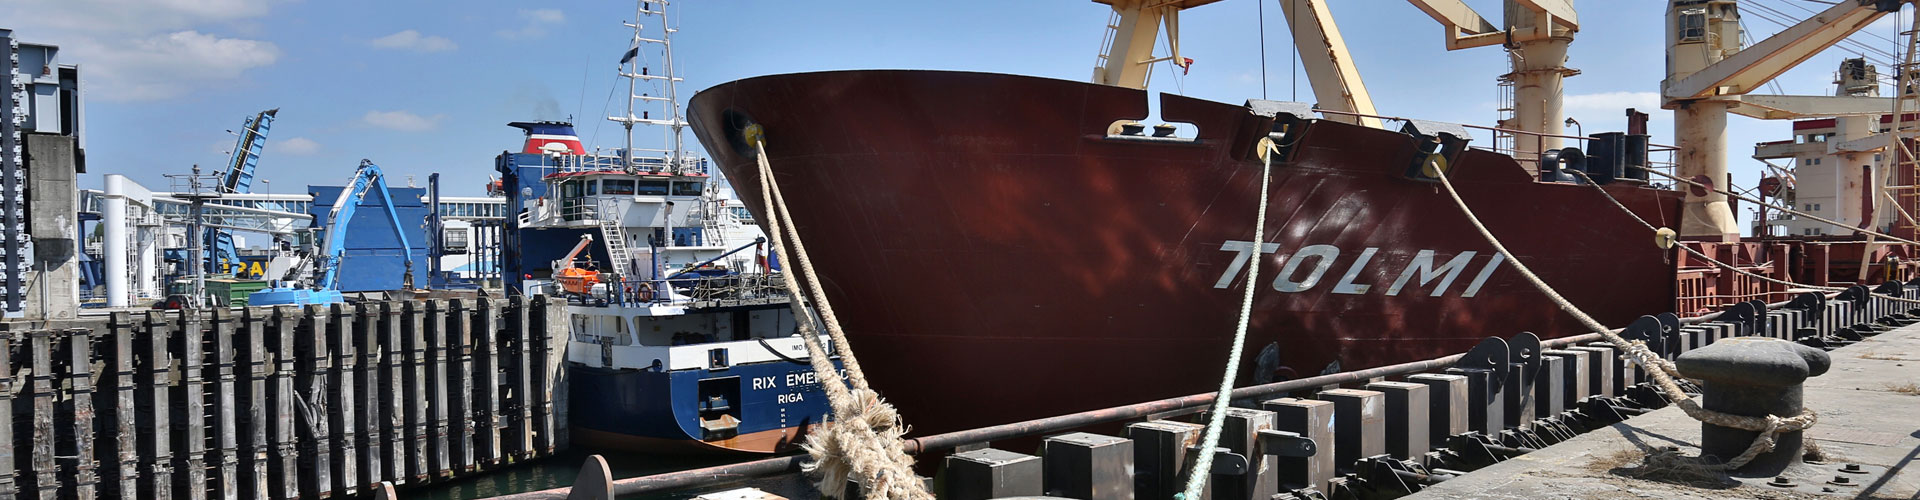 viela-export-vierow-mukran-shipping-schiffe-entladen-beladen-tramp-03